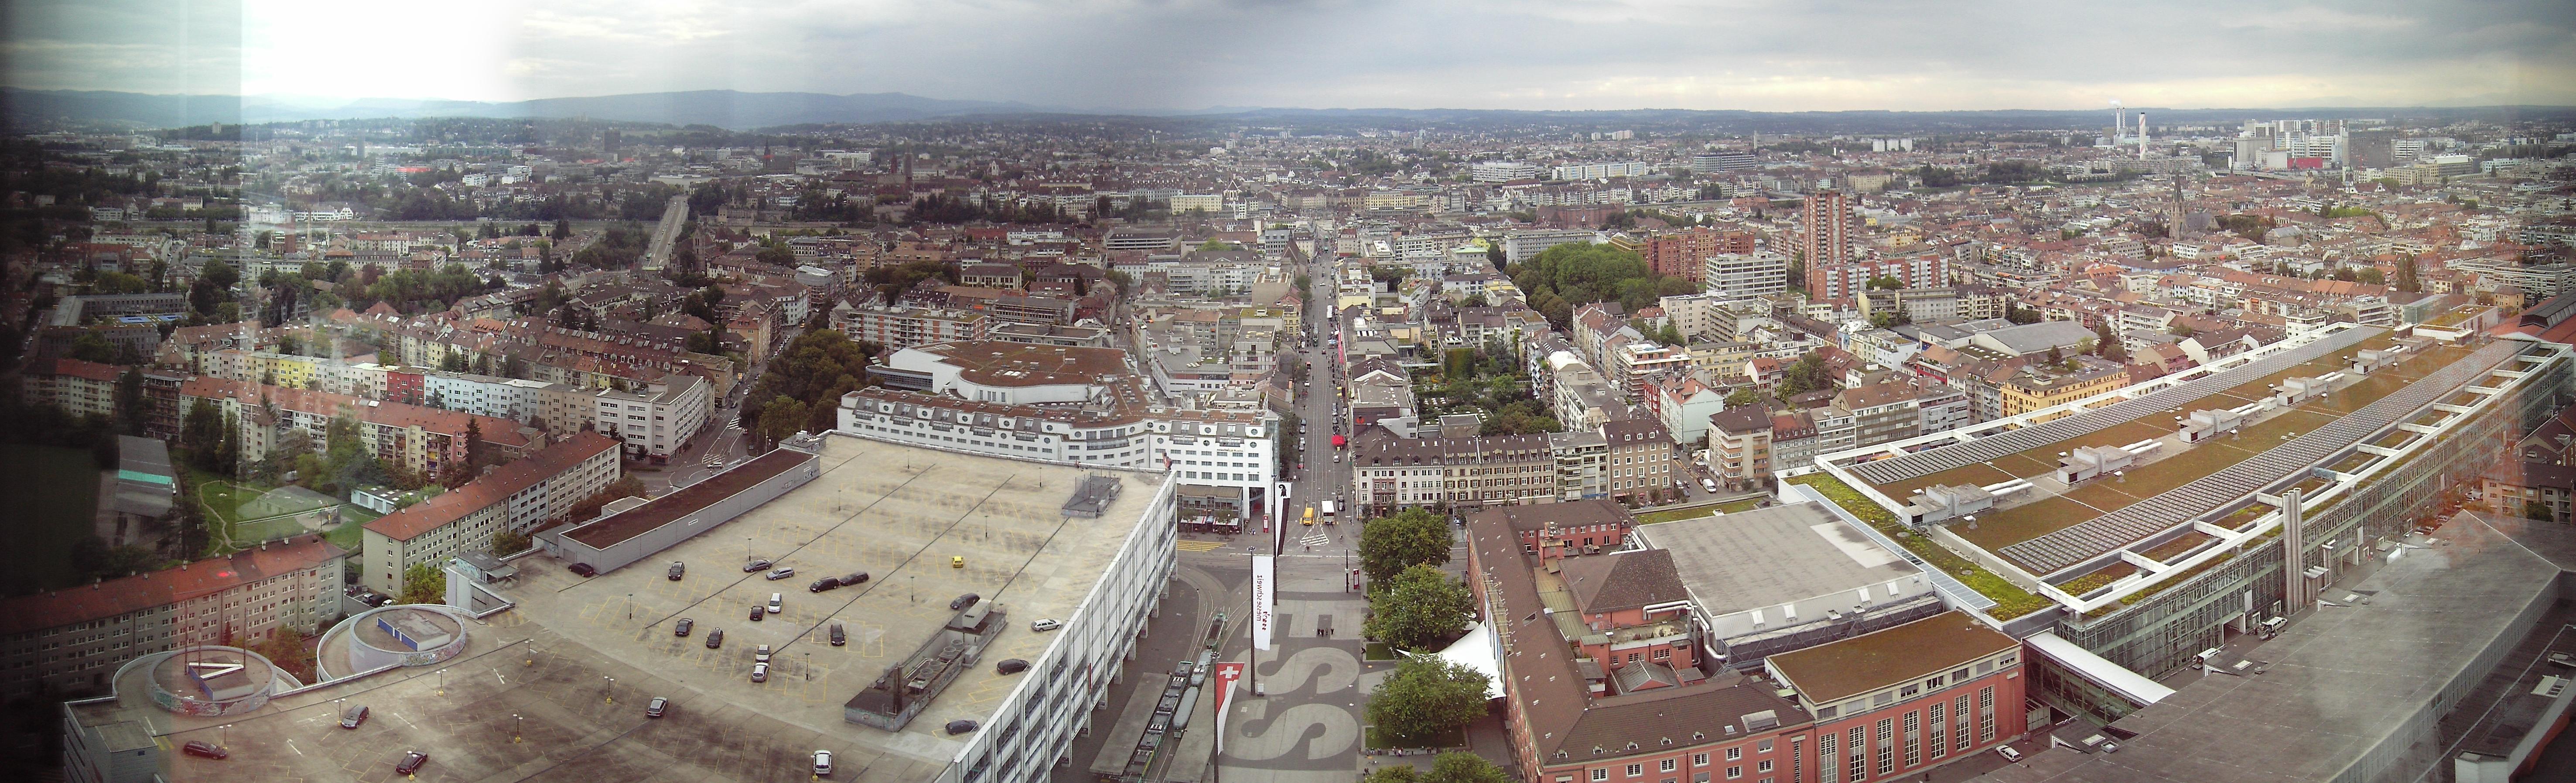 Panorama von Basel